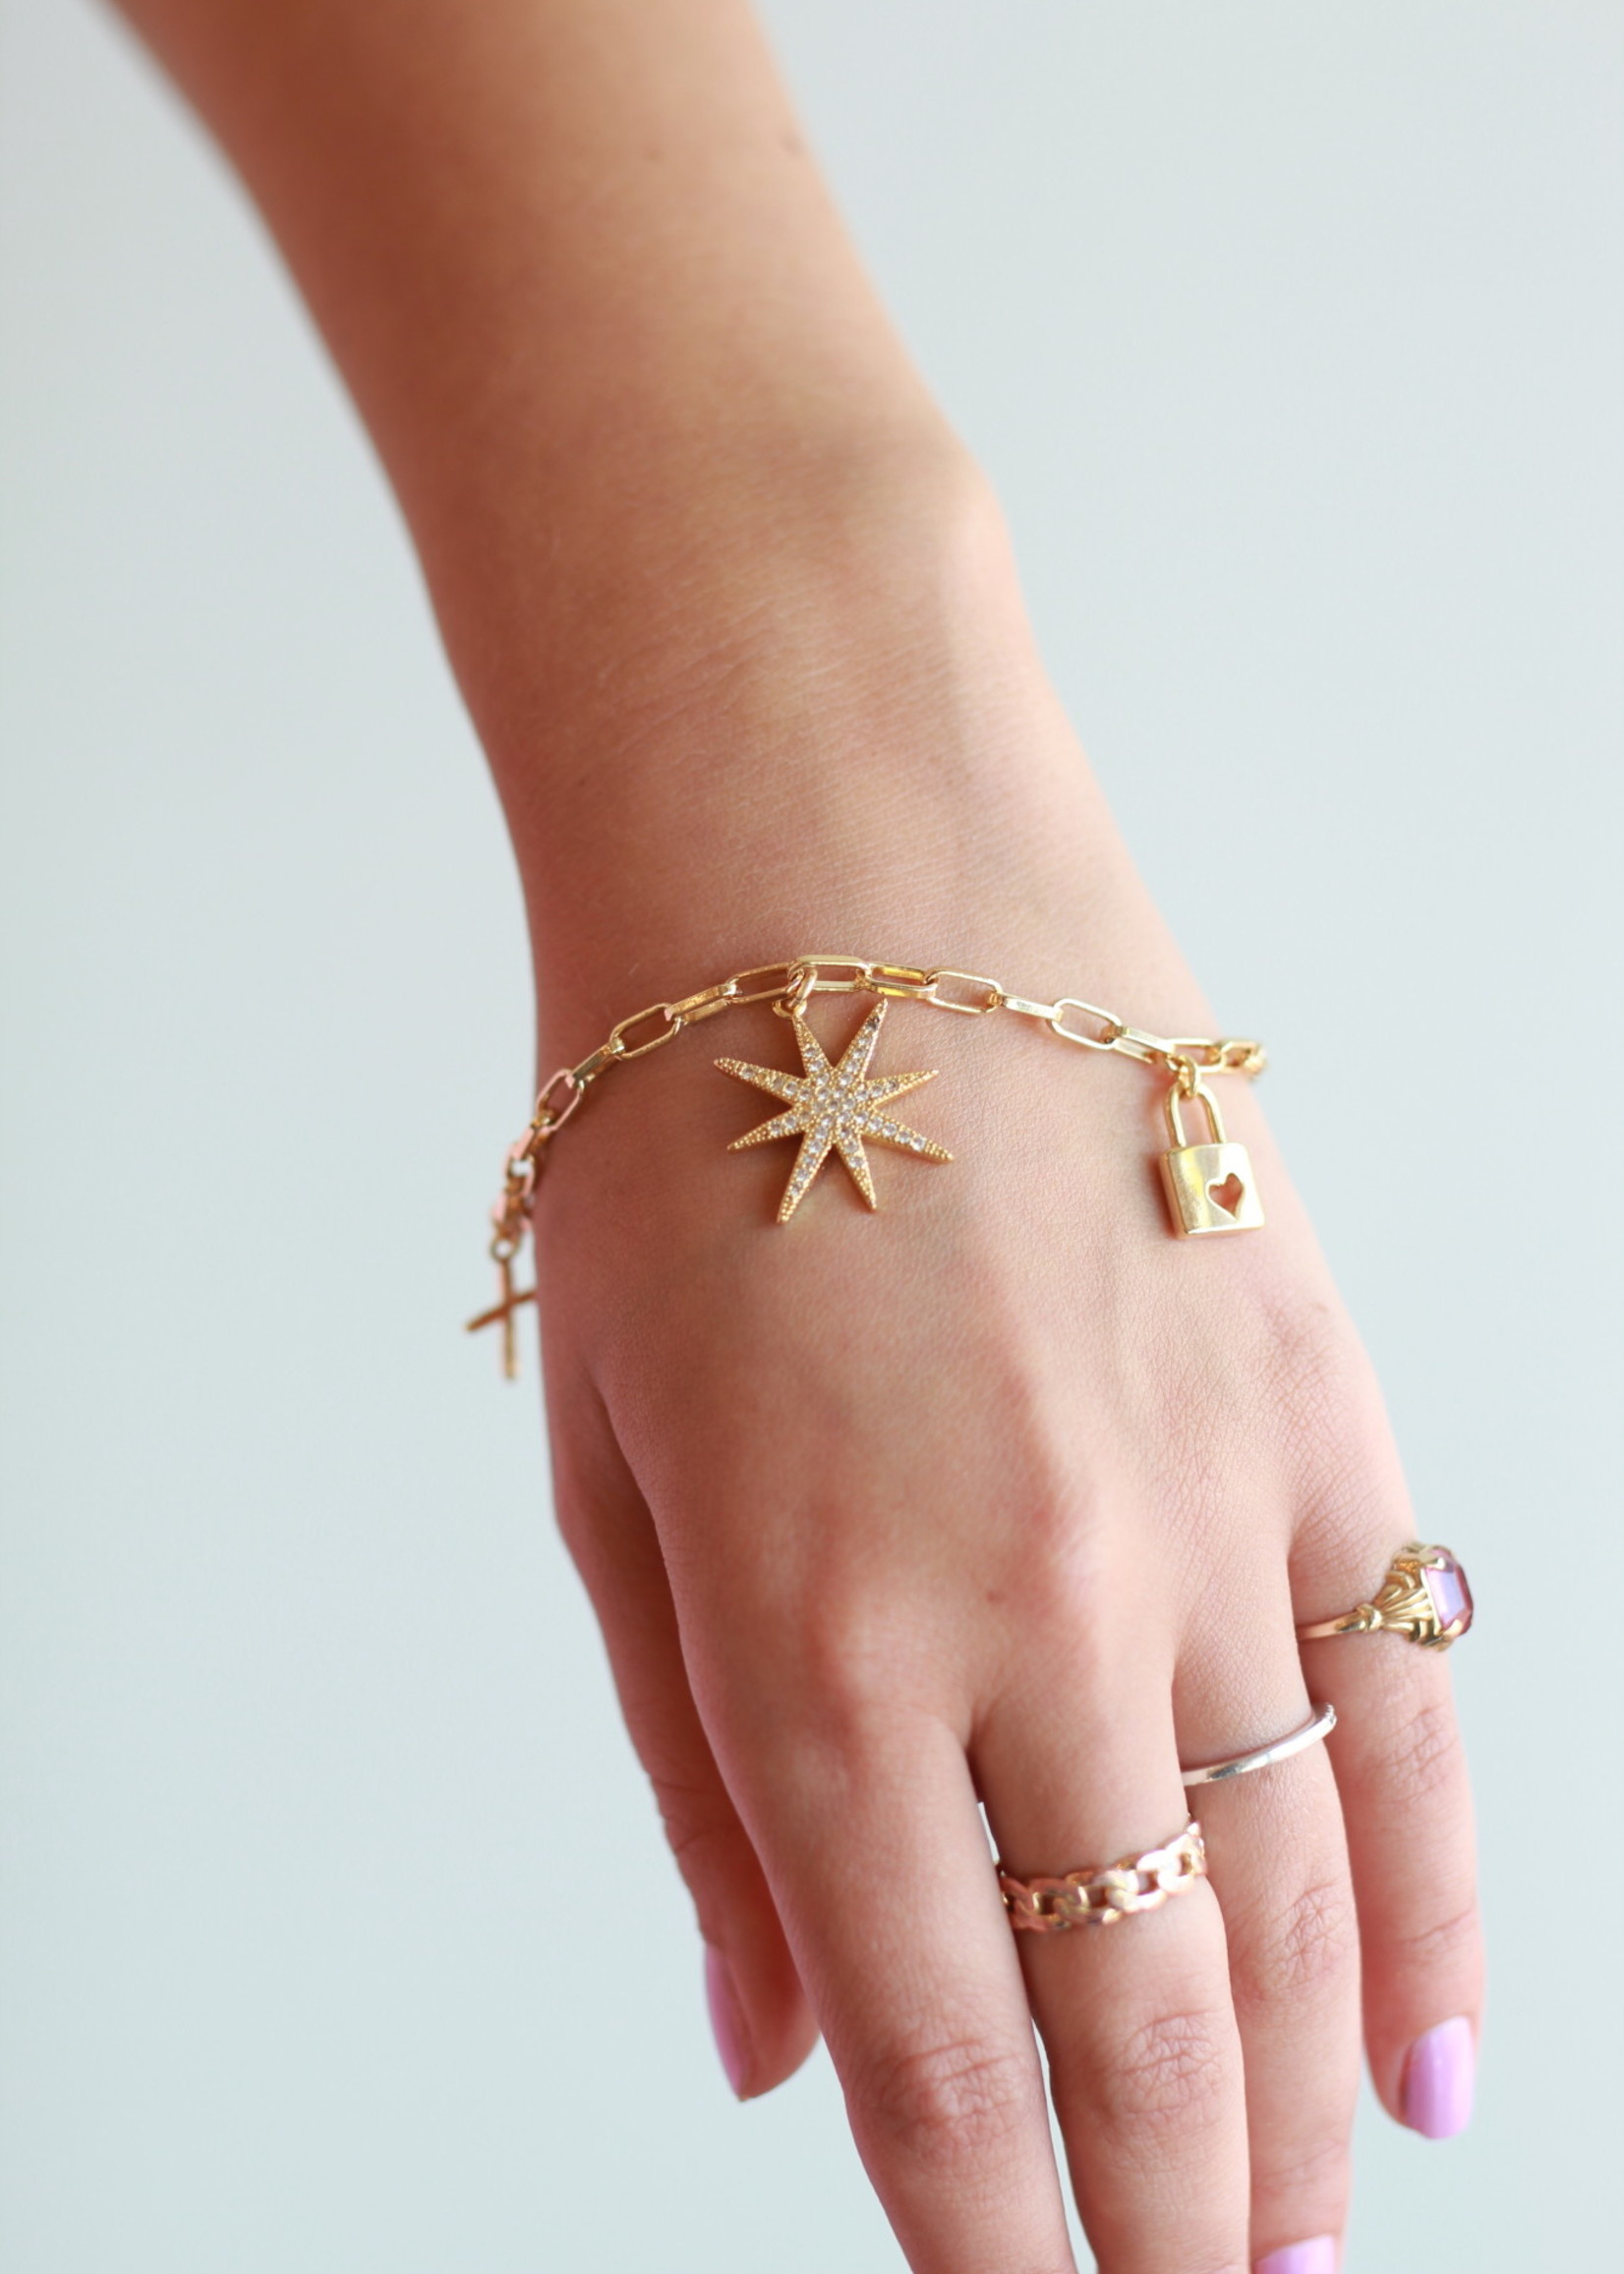 Allison Conway AC Lover Charm Bracelet